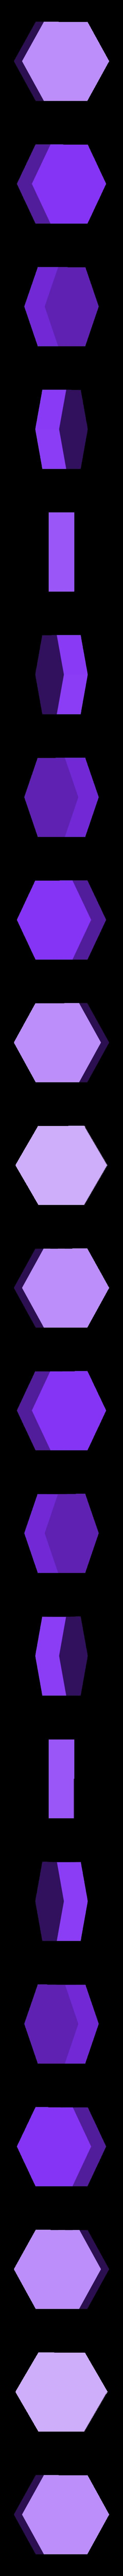 Hexagon Shape.obj Download free OBJ file Hexagon Shape • 3D printable model, 3DBuilder